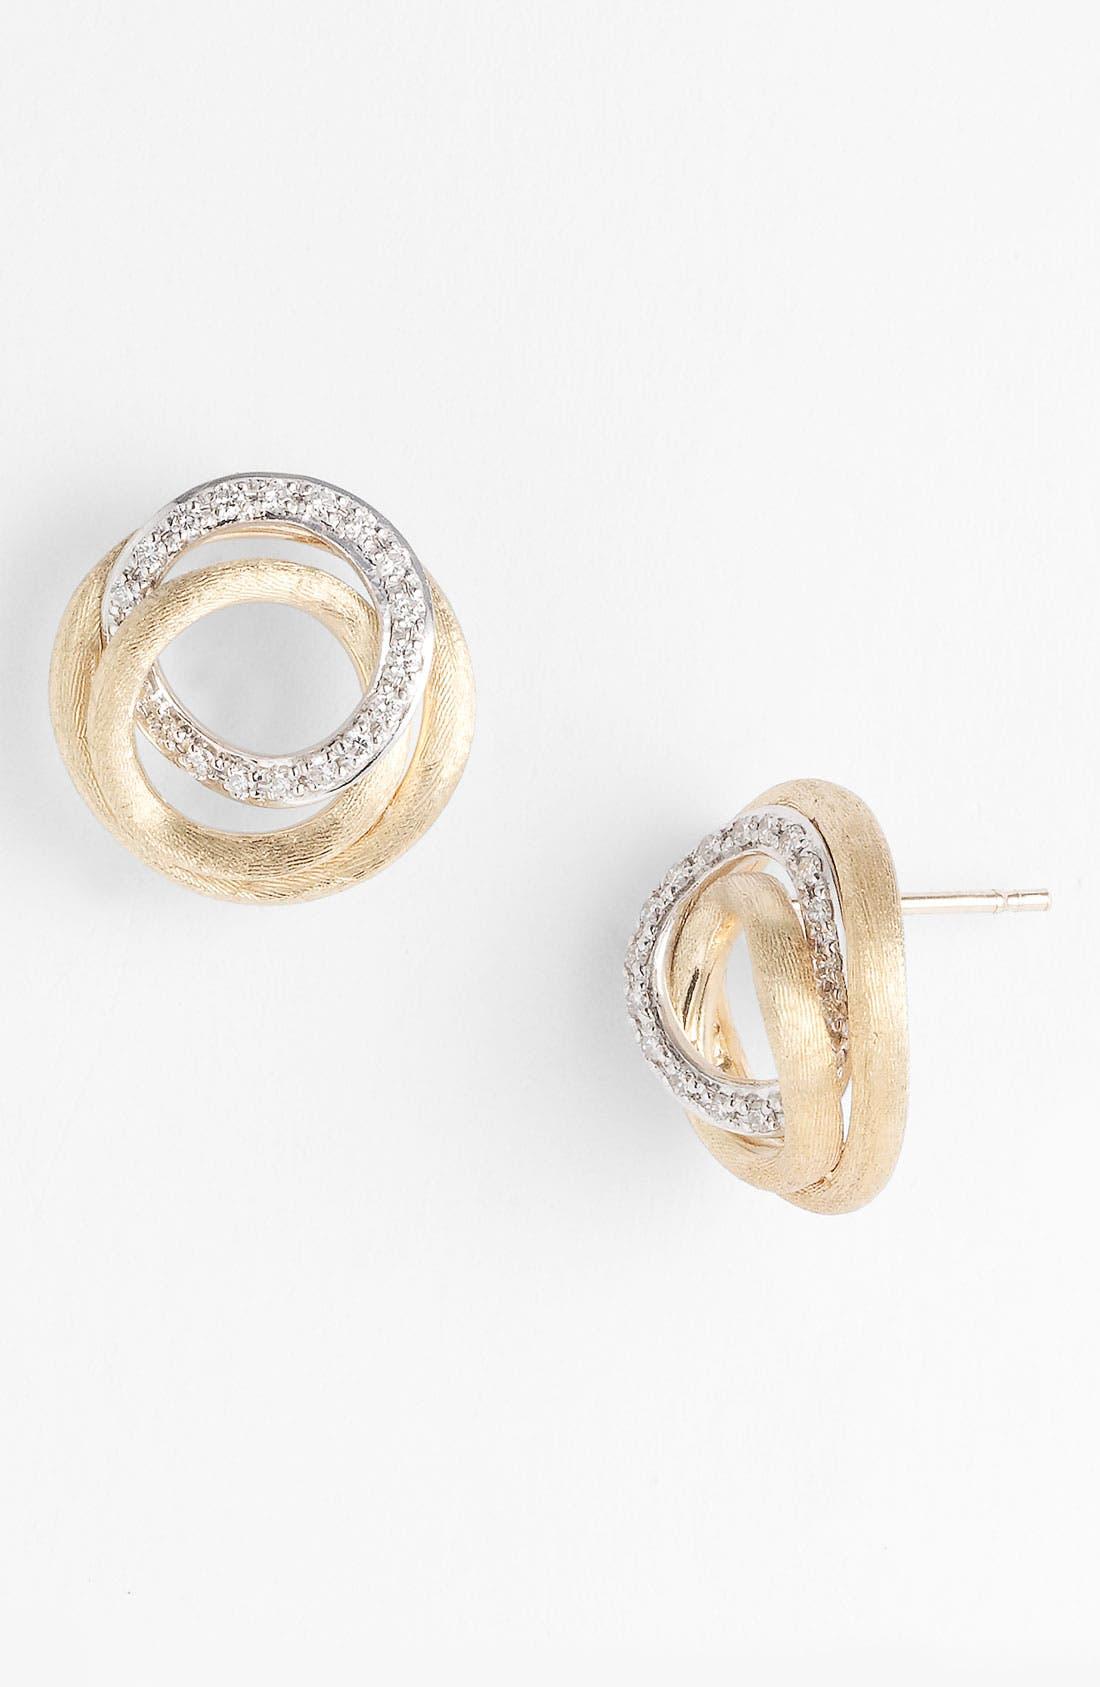 Alternate Image 1 Selected - Marco Bicego 'Jaipur' Diamond Link Stud Earrings